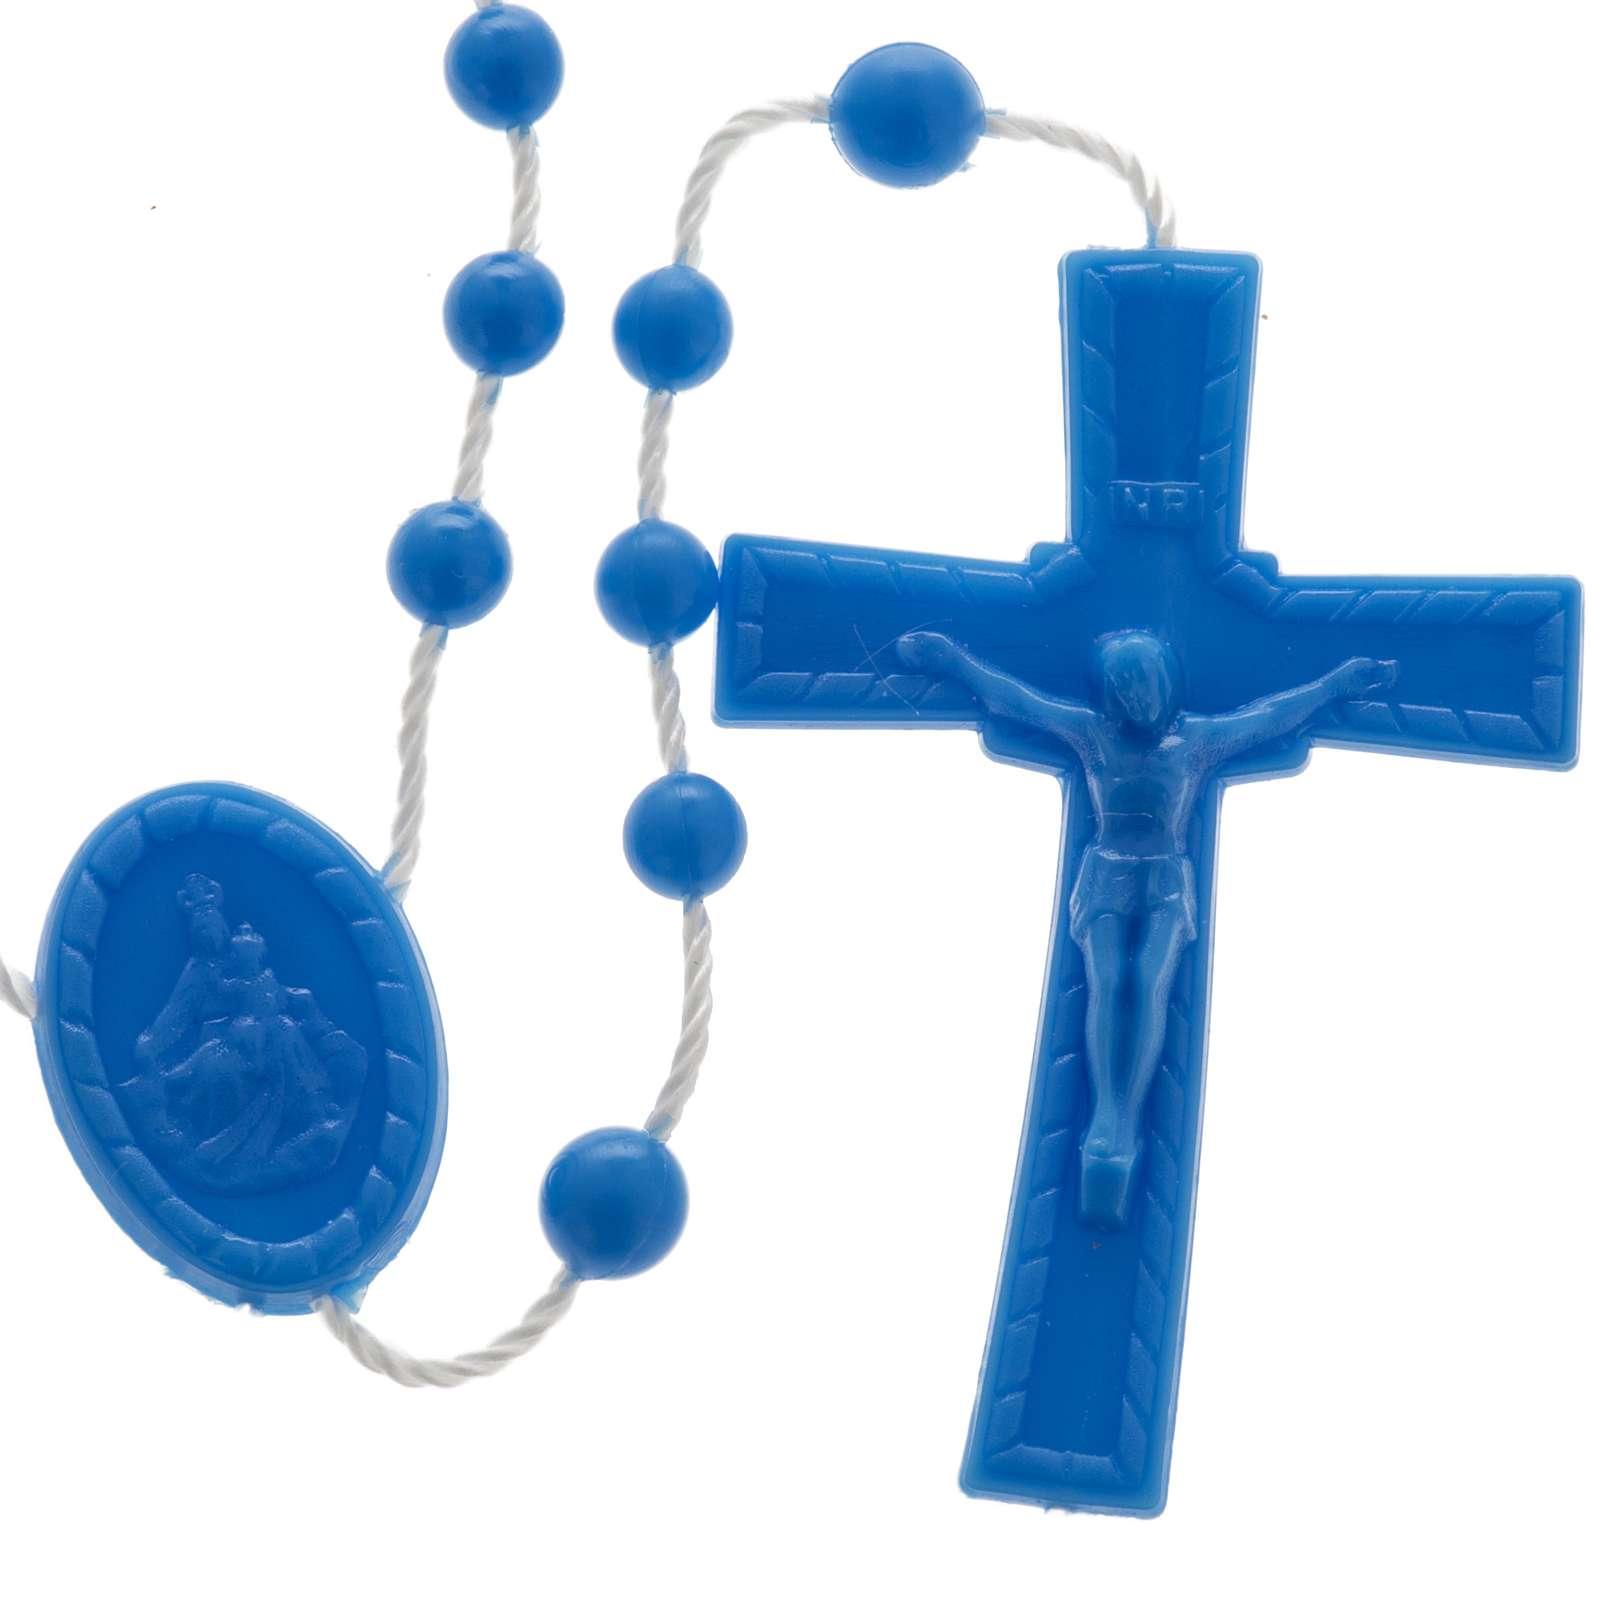 Chapelet en nylon bleu 4